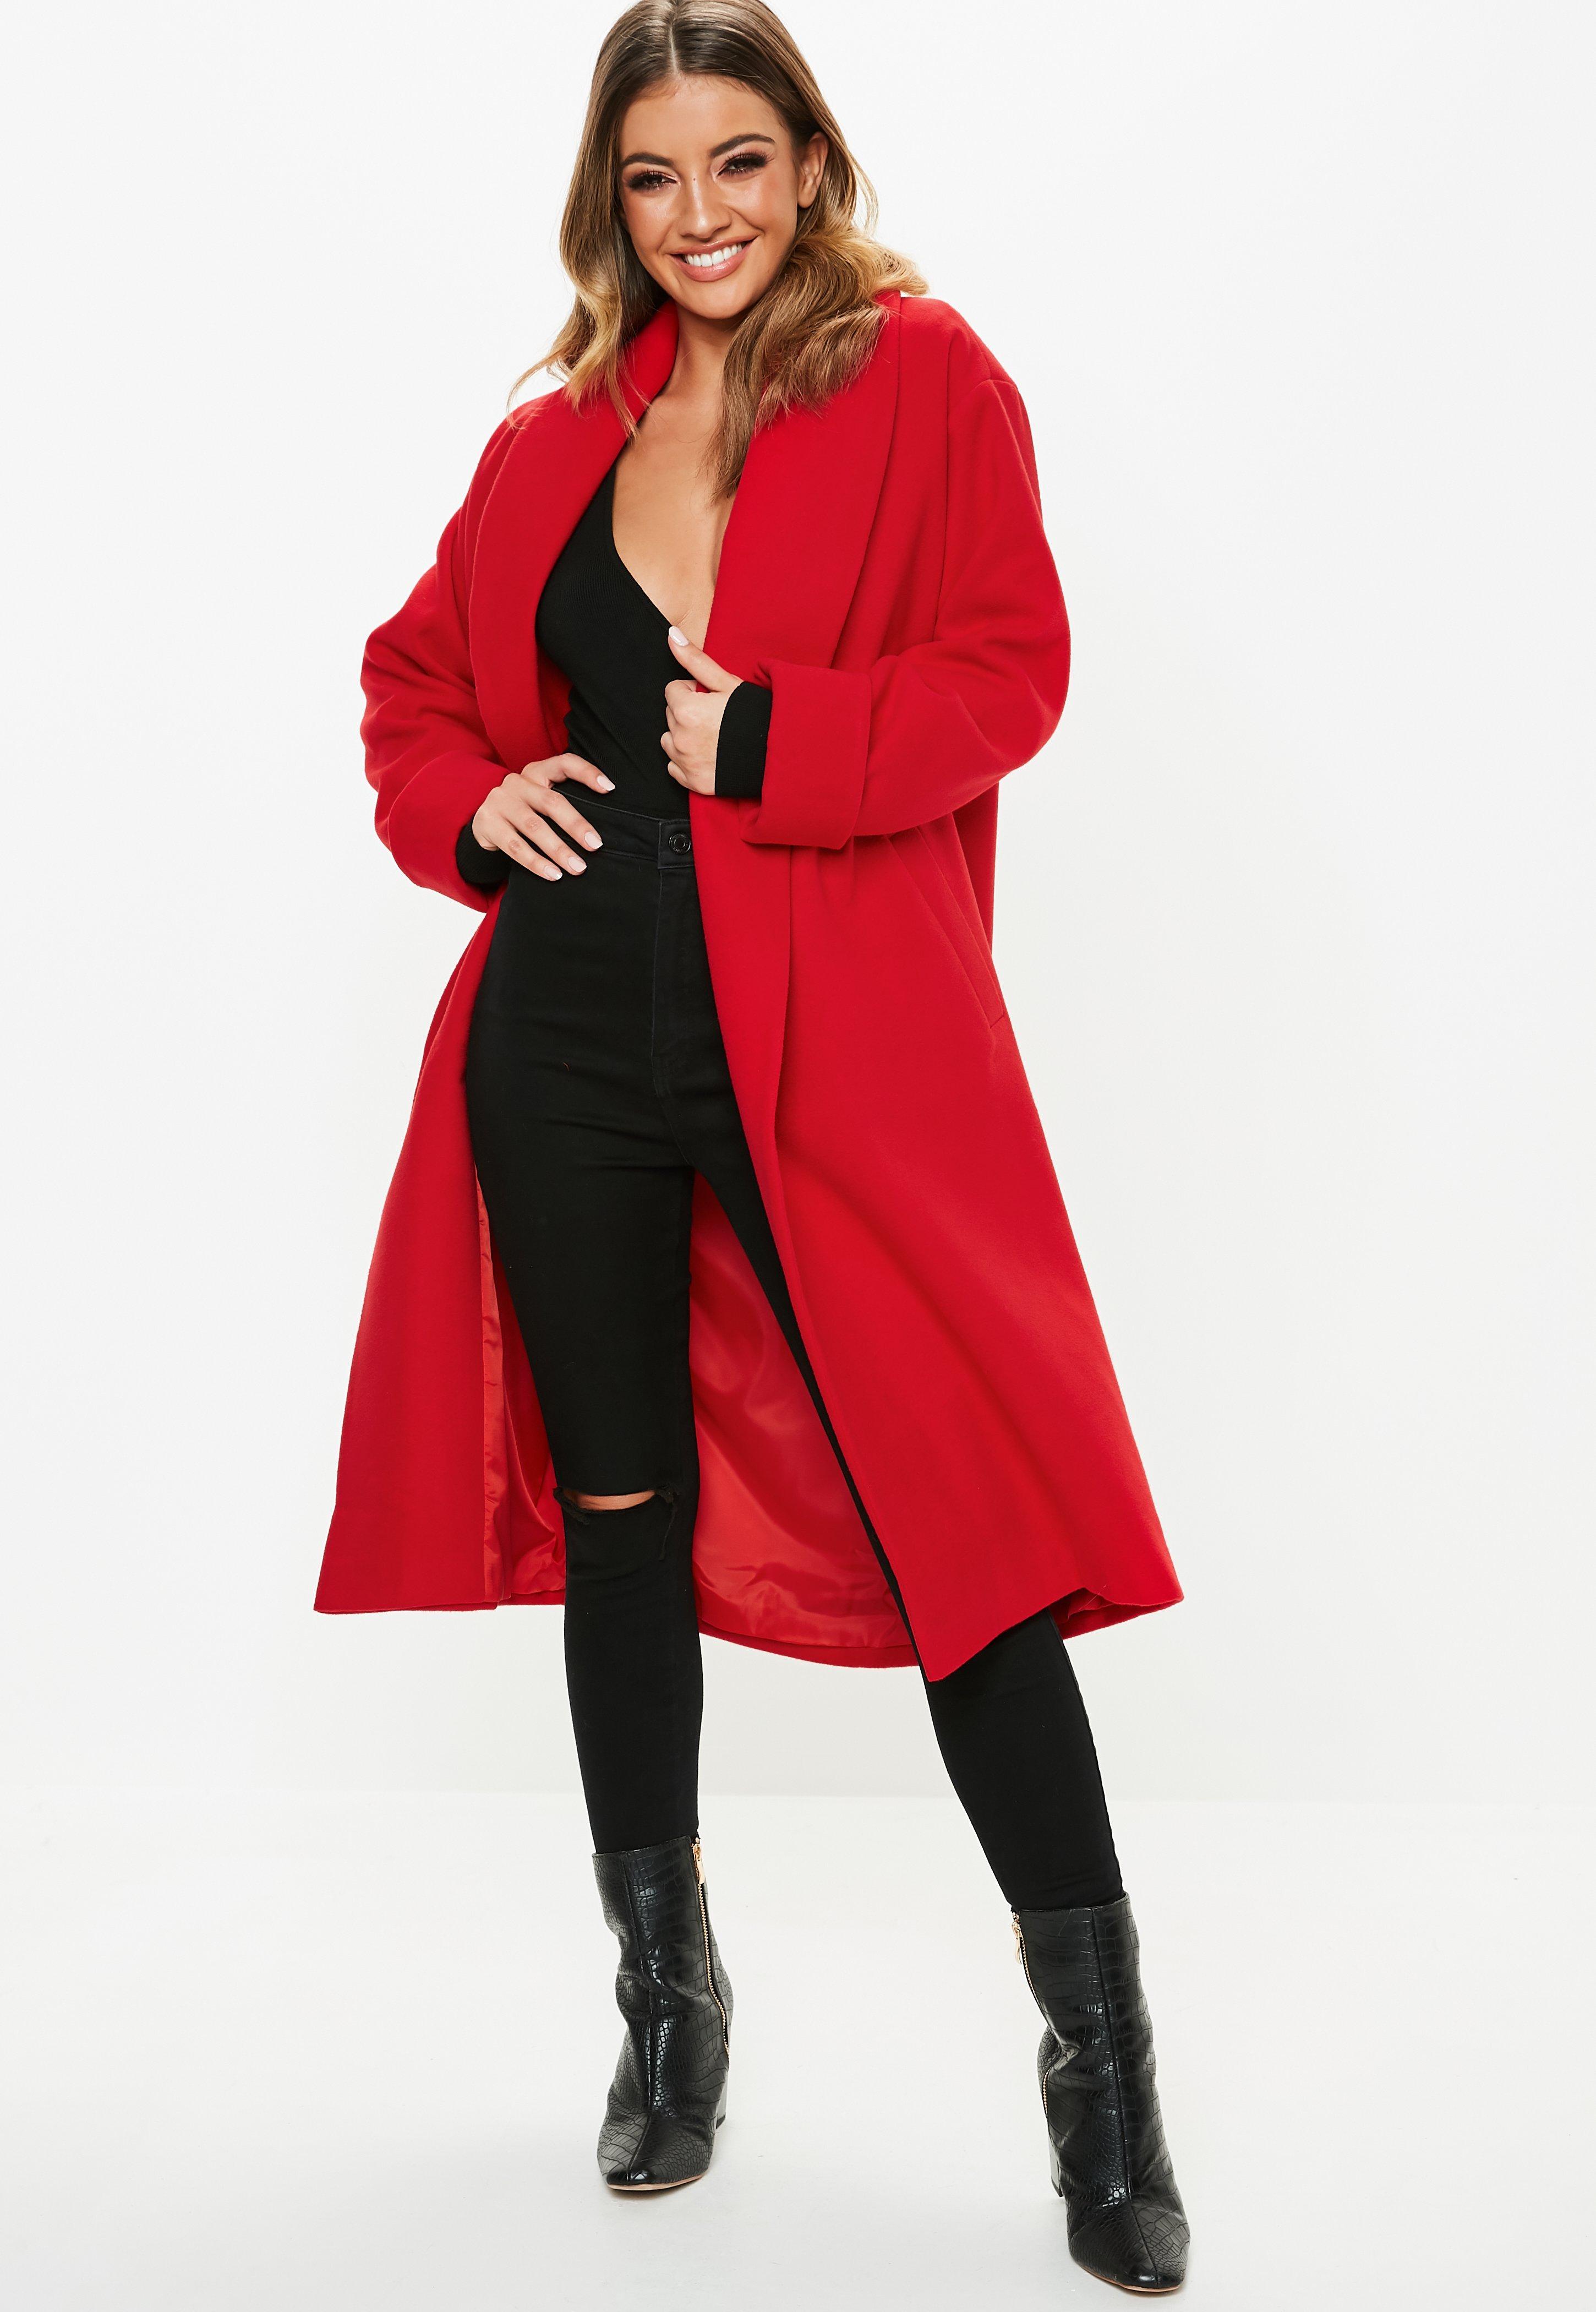 f65b1e467e Winter Clothes and Fashion - Missguided